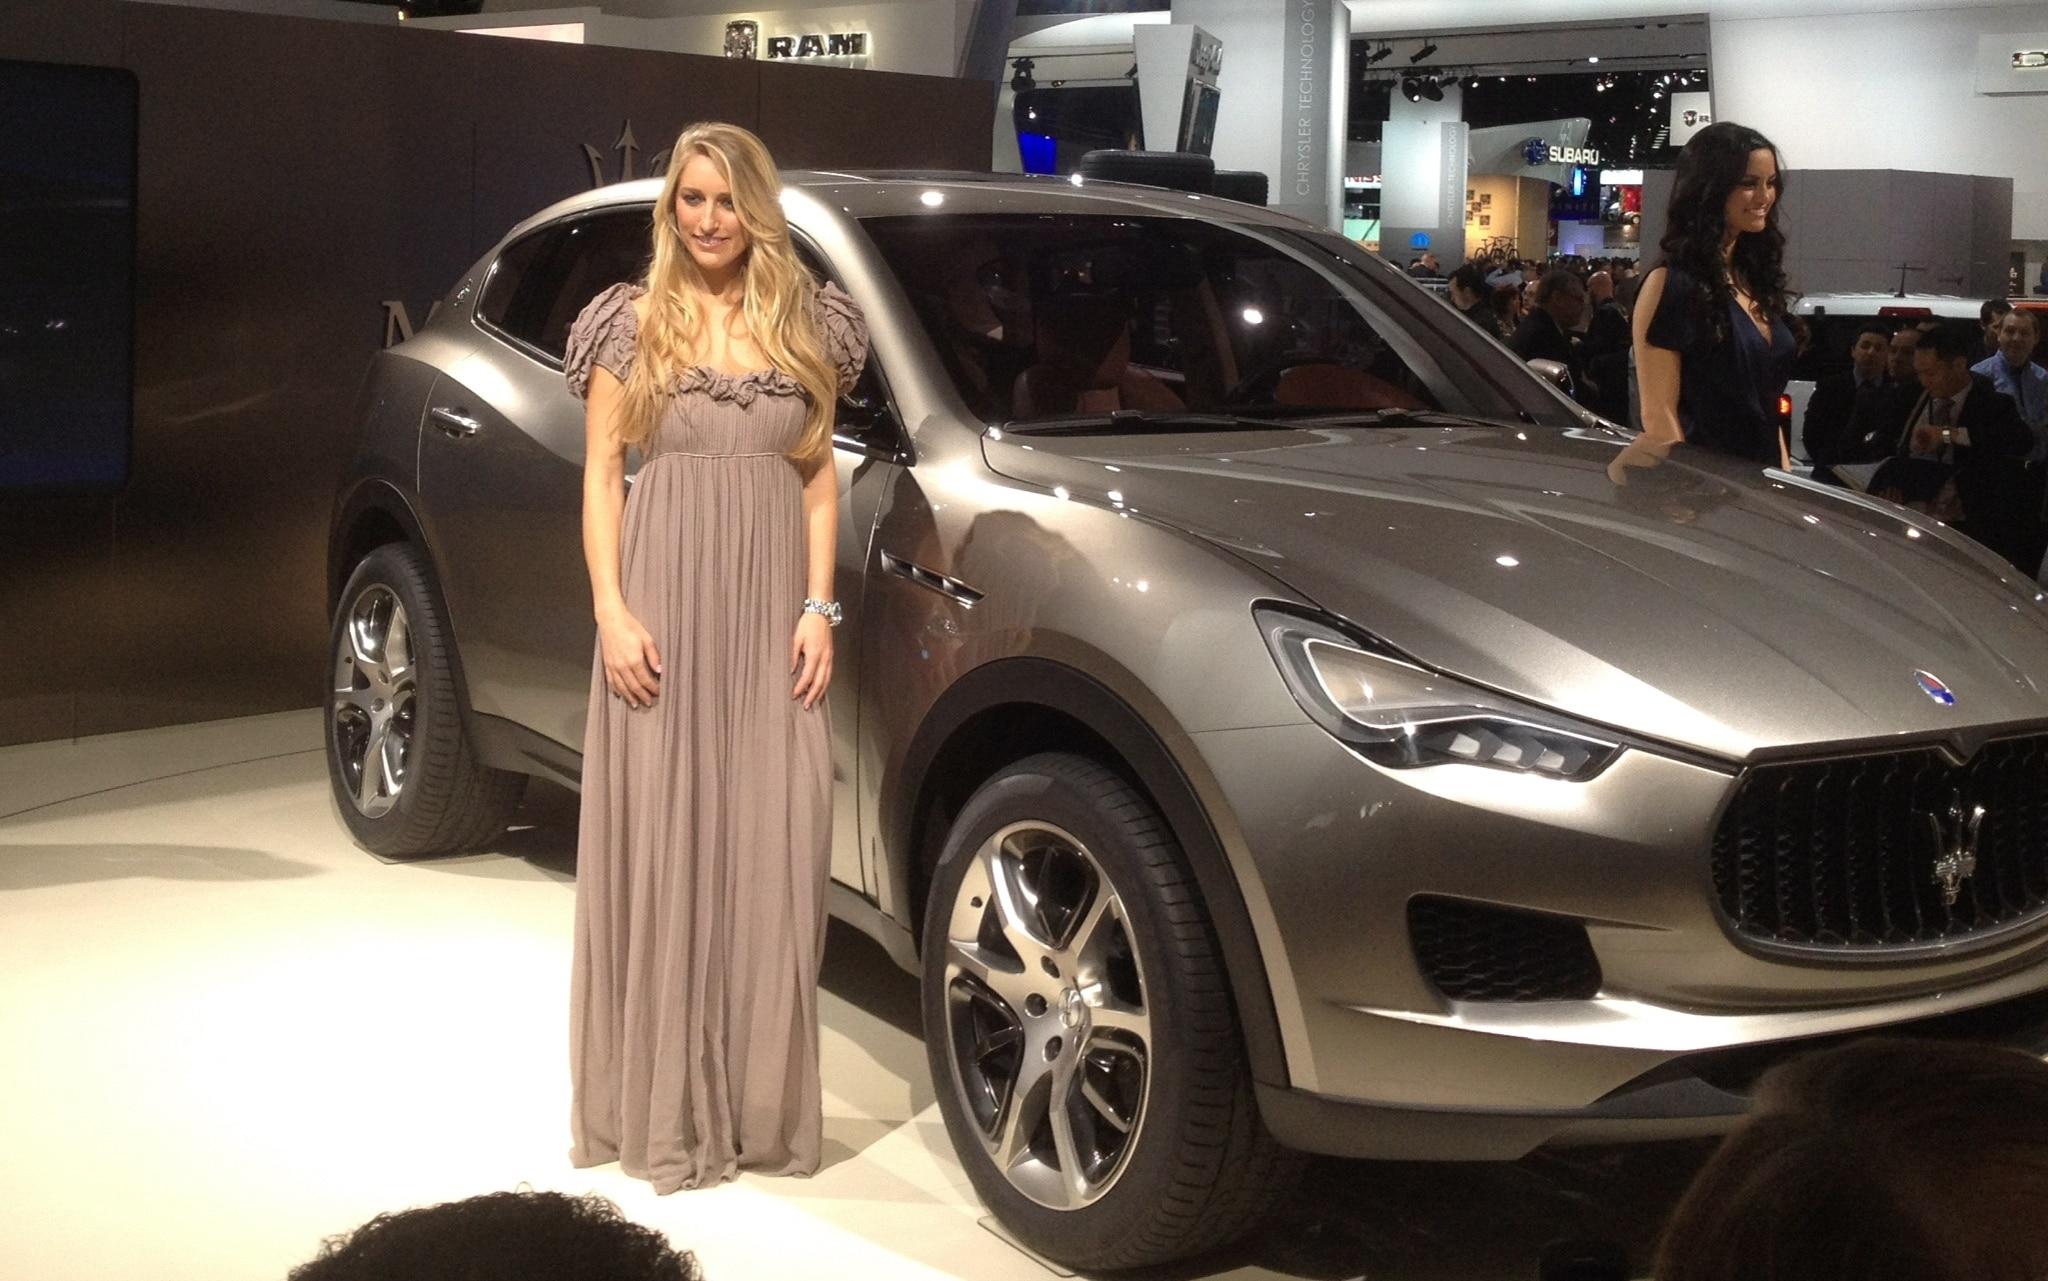 Maserati Kubang Booth Babe1